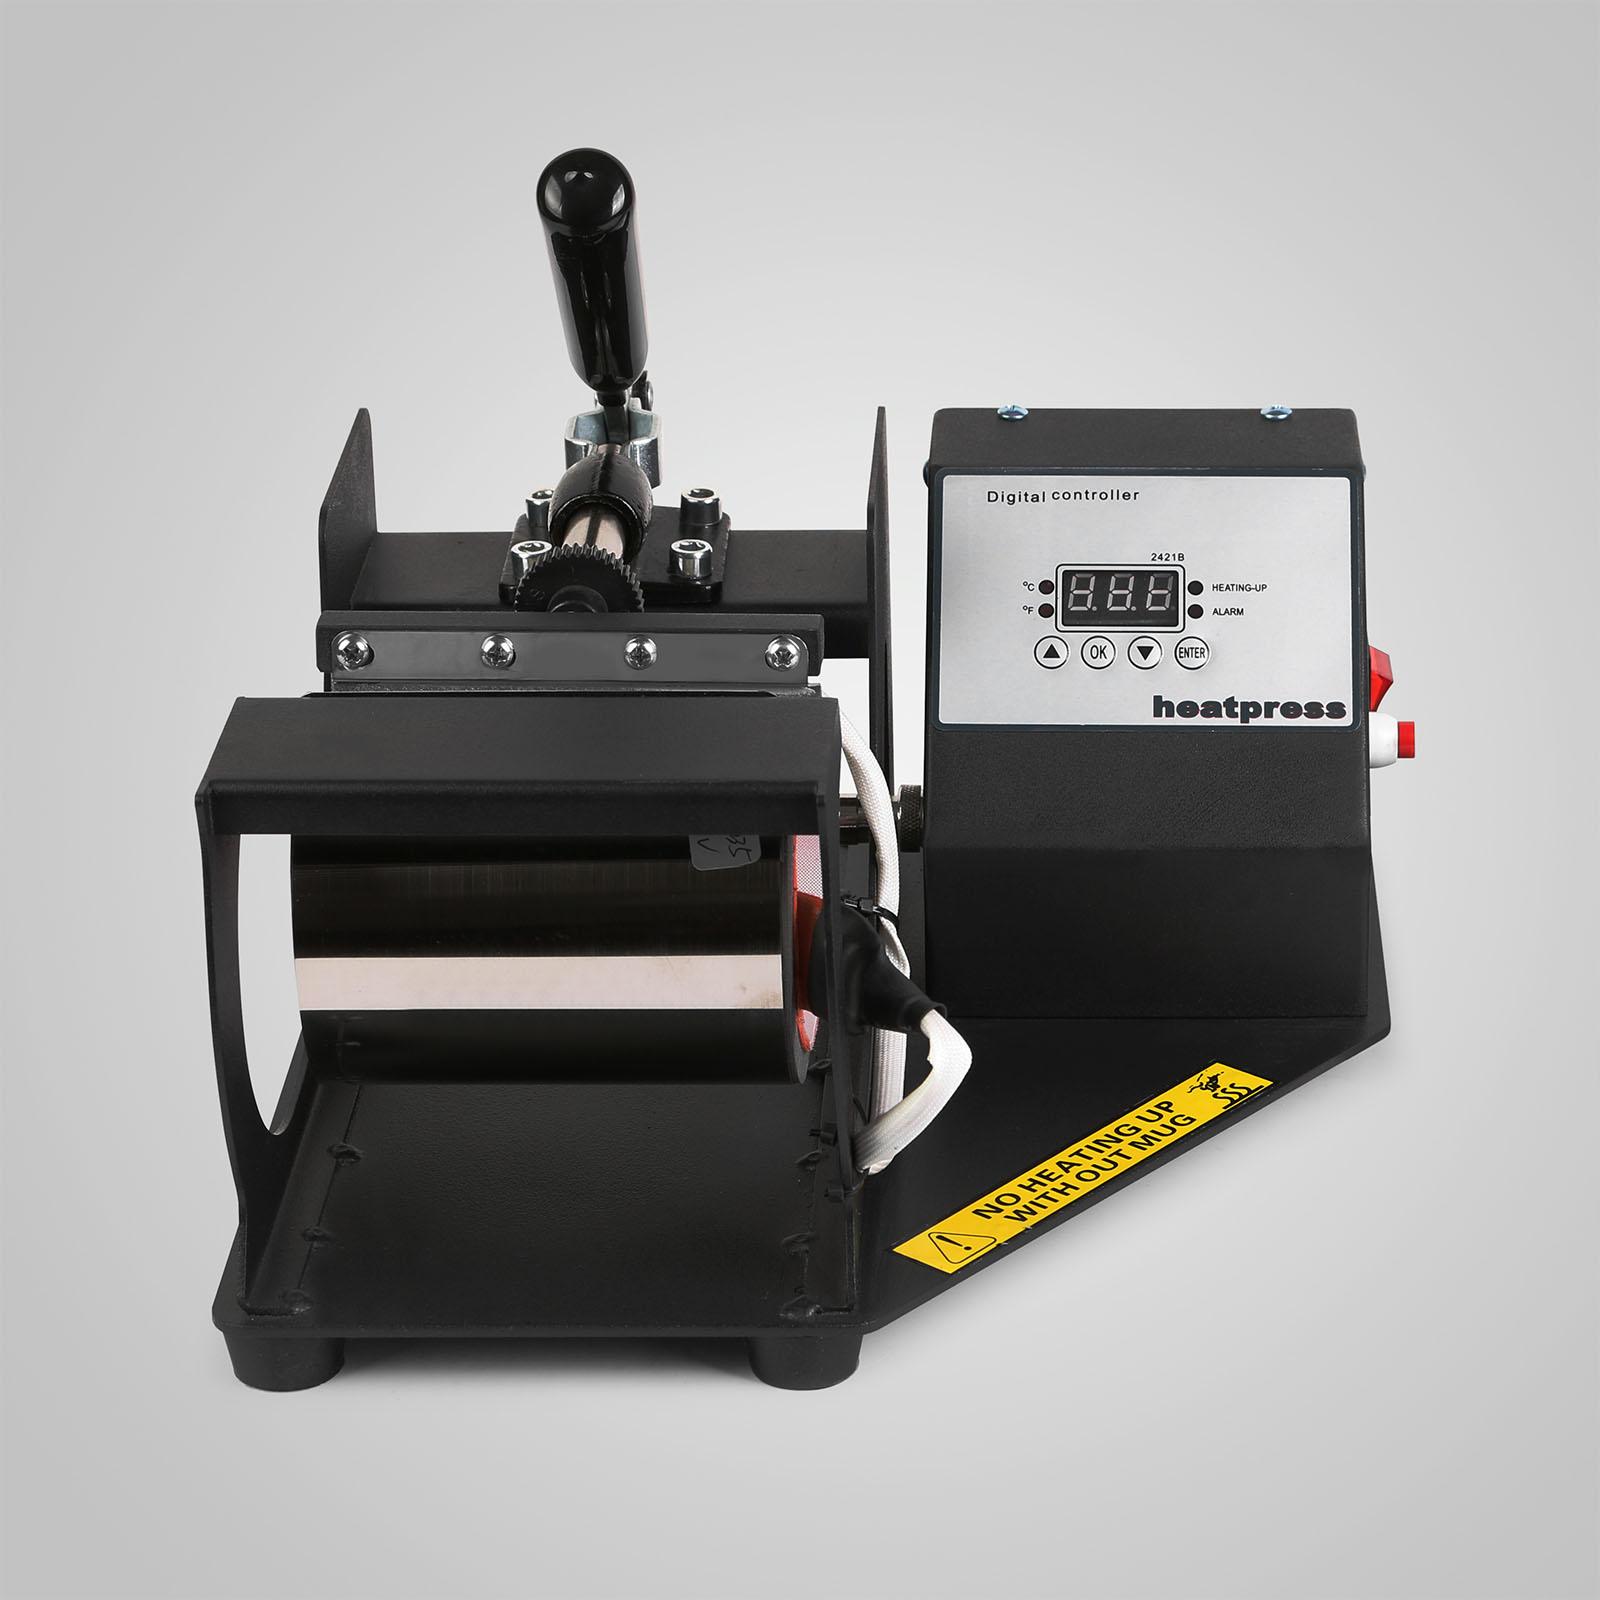 5en1 6en1 8en1 presse chaud transfert textile pressage imprim impression ebay. Black Bedroom Furniture Sets. Home Design Ideas